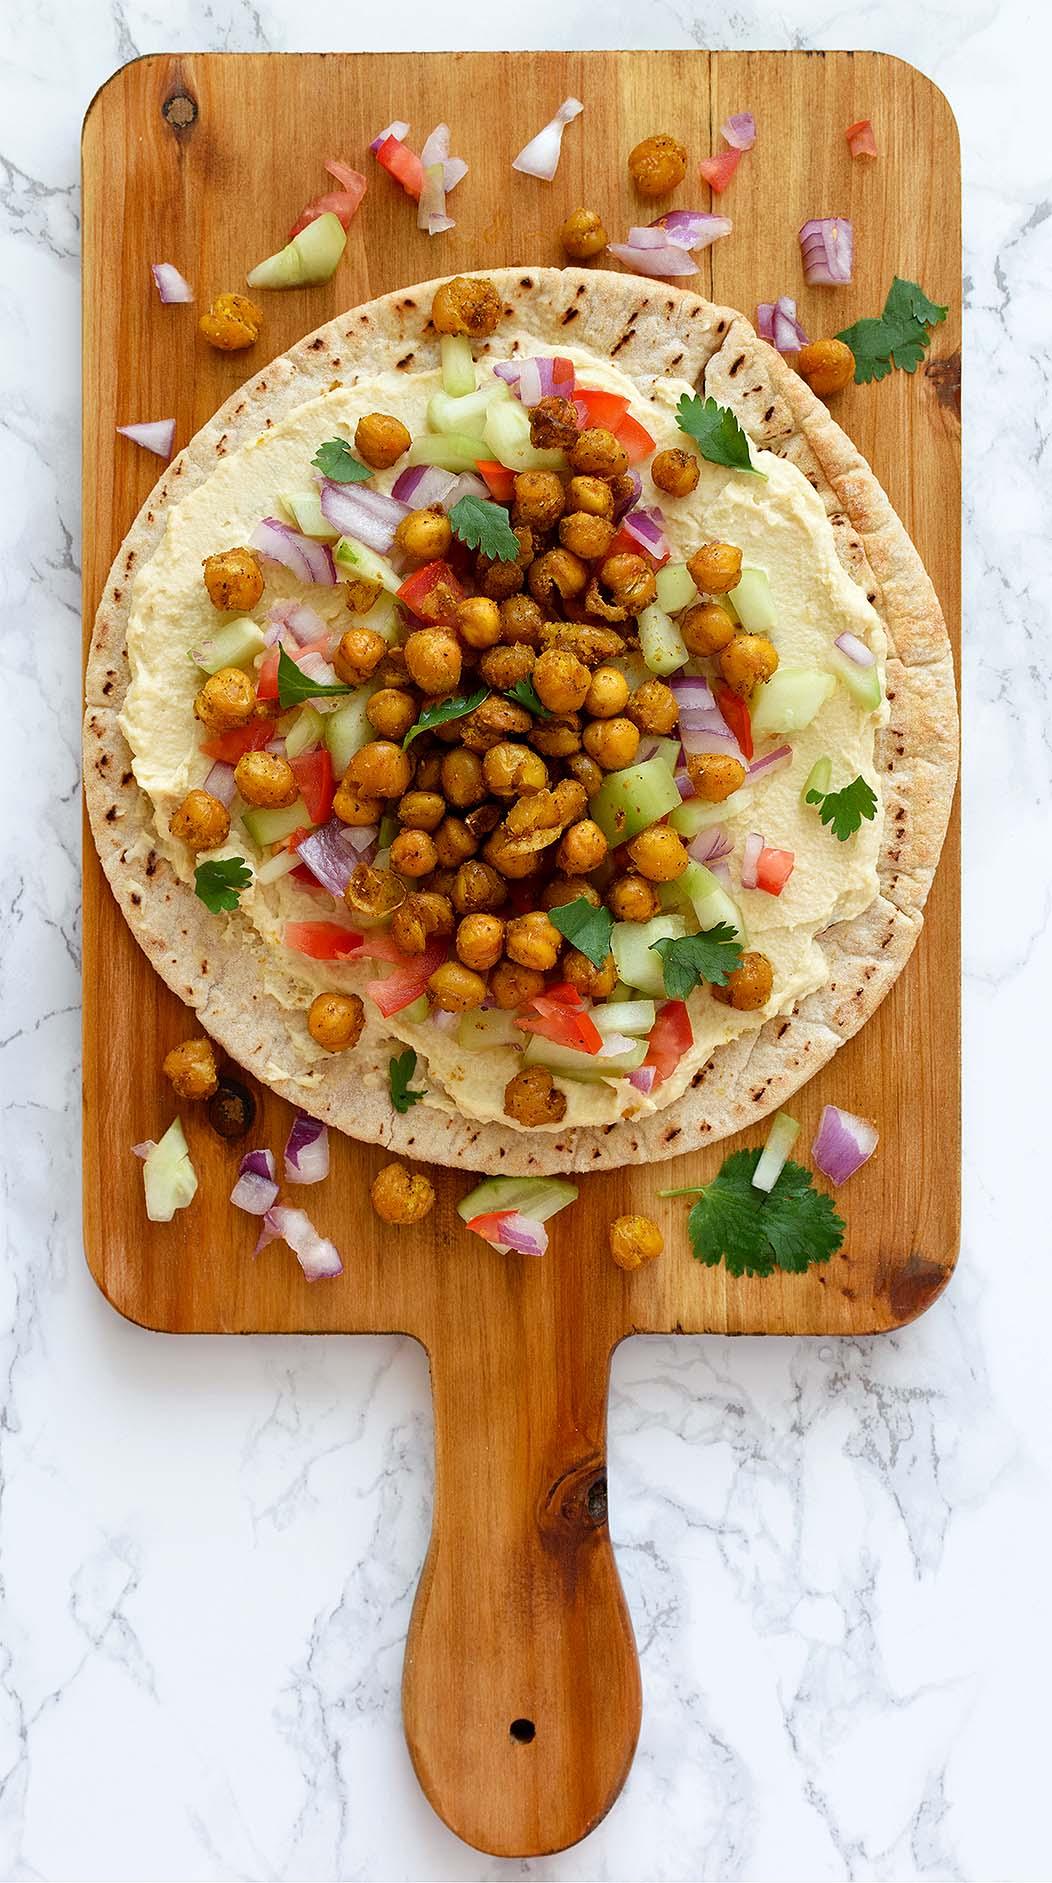 Roasted Chickpeas Hummus Wrap - Pepper Delight #pepperdelightblog #wrap #roll #vegetarianwrap #chickpeaswrap #hummuswrap #pitawrap #hummus #classichummus #appetizer #christmas #celebration #party #gameday #vegetarian #arabic #mediterranean #dip #glutenfree #garammasala #chickpeas #meatlessrecipe